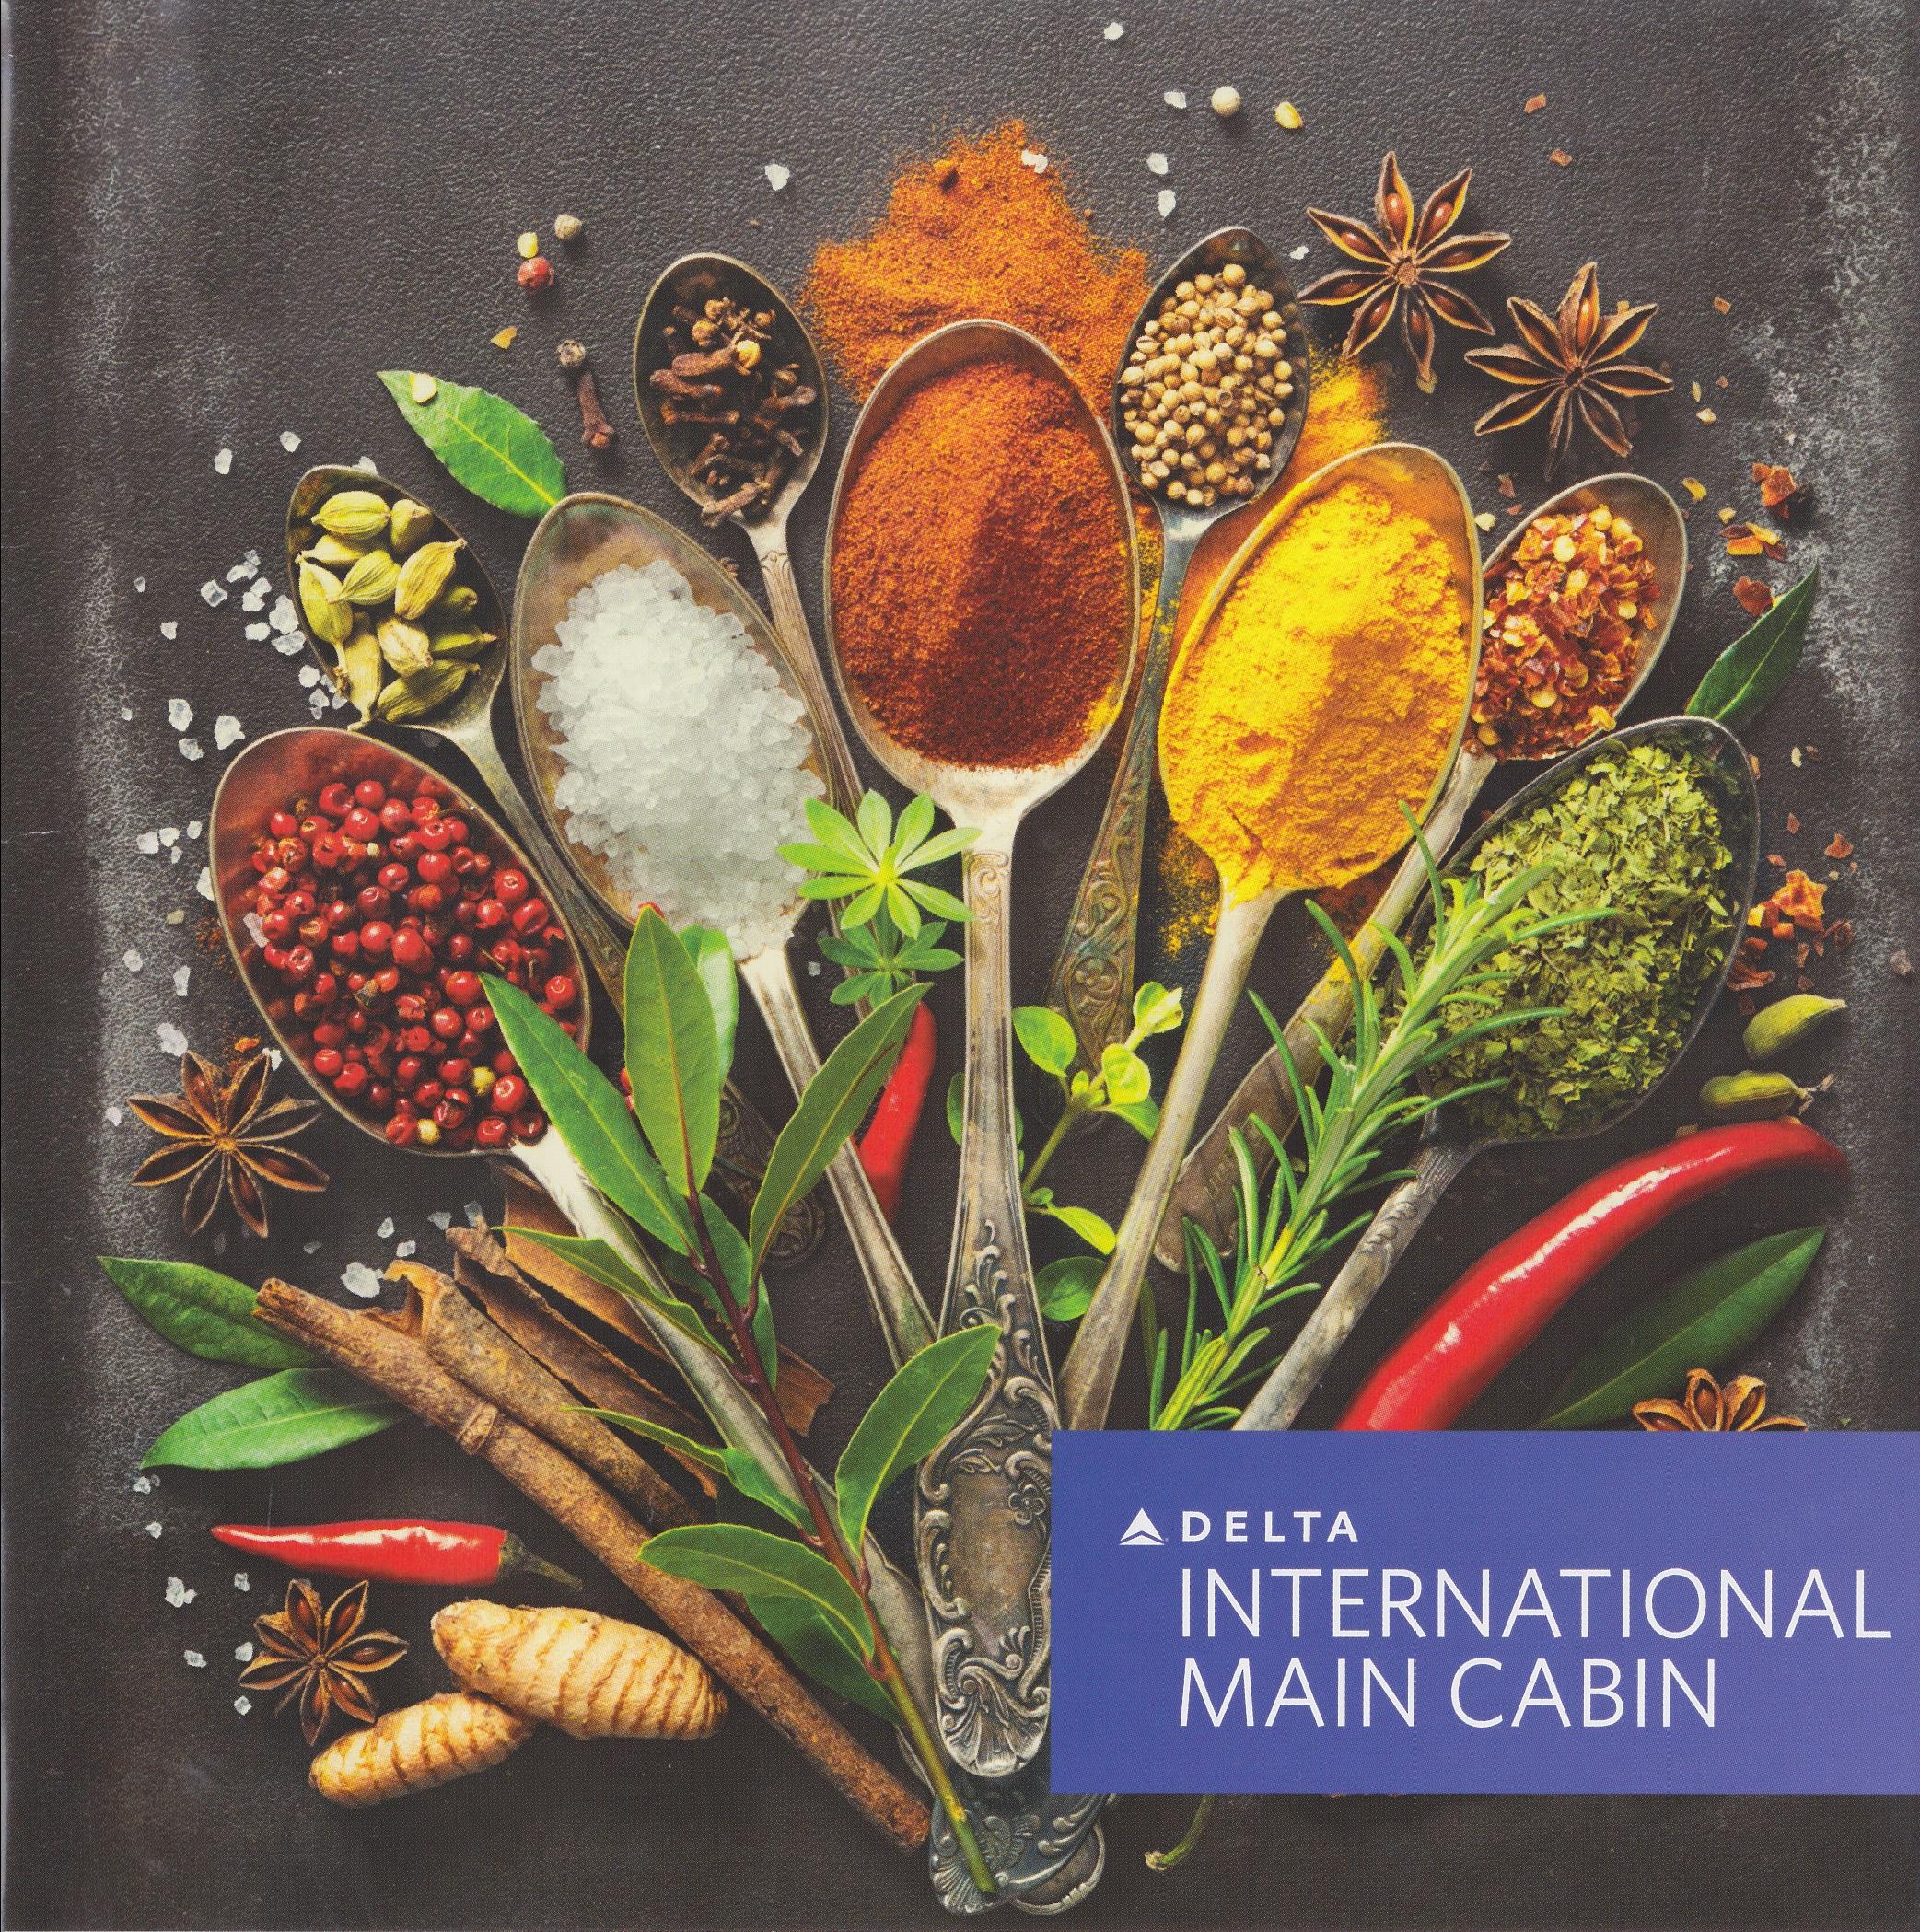 delta airlines international main cabin menu